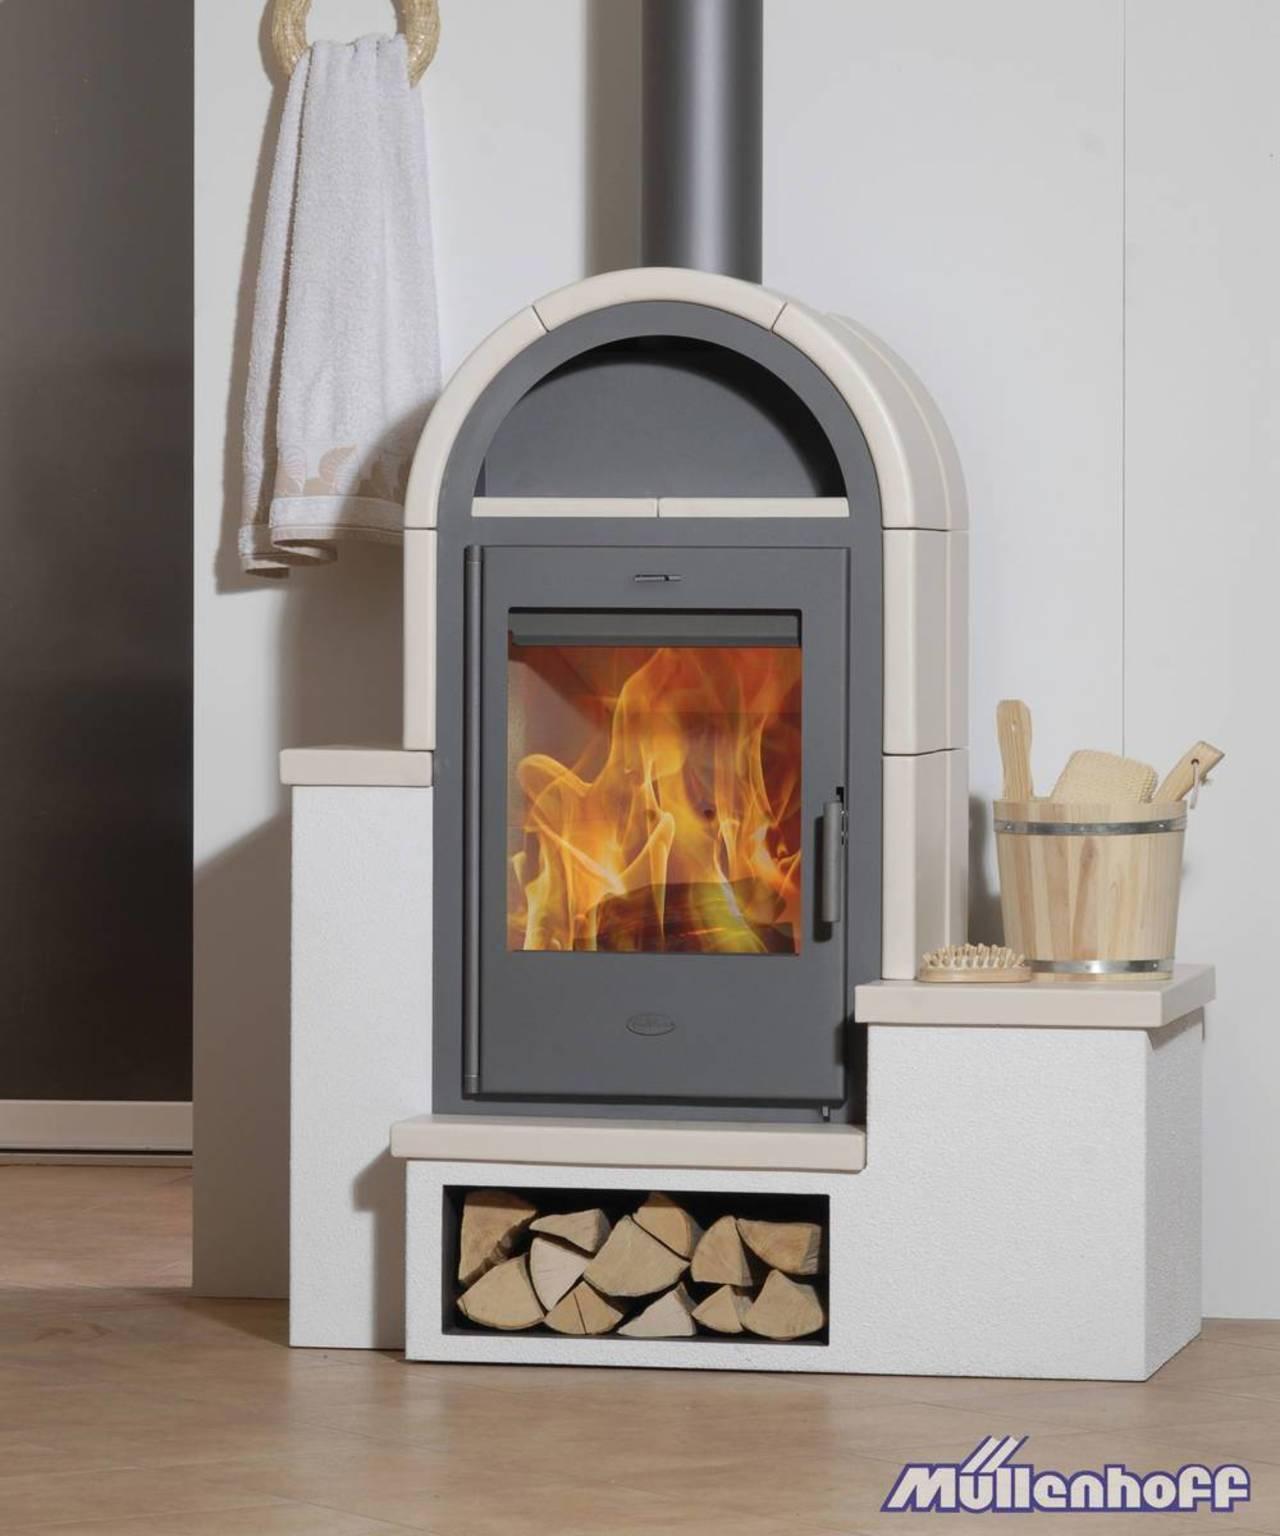 fireplace kaminofen serena mit kacheln beige sitzbank 7 kw kamin ofen holz ebay. Black Bedroom Furniture Sets. Home Design Ideas